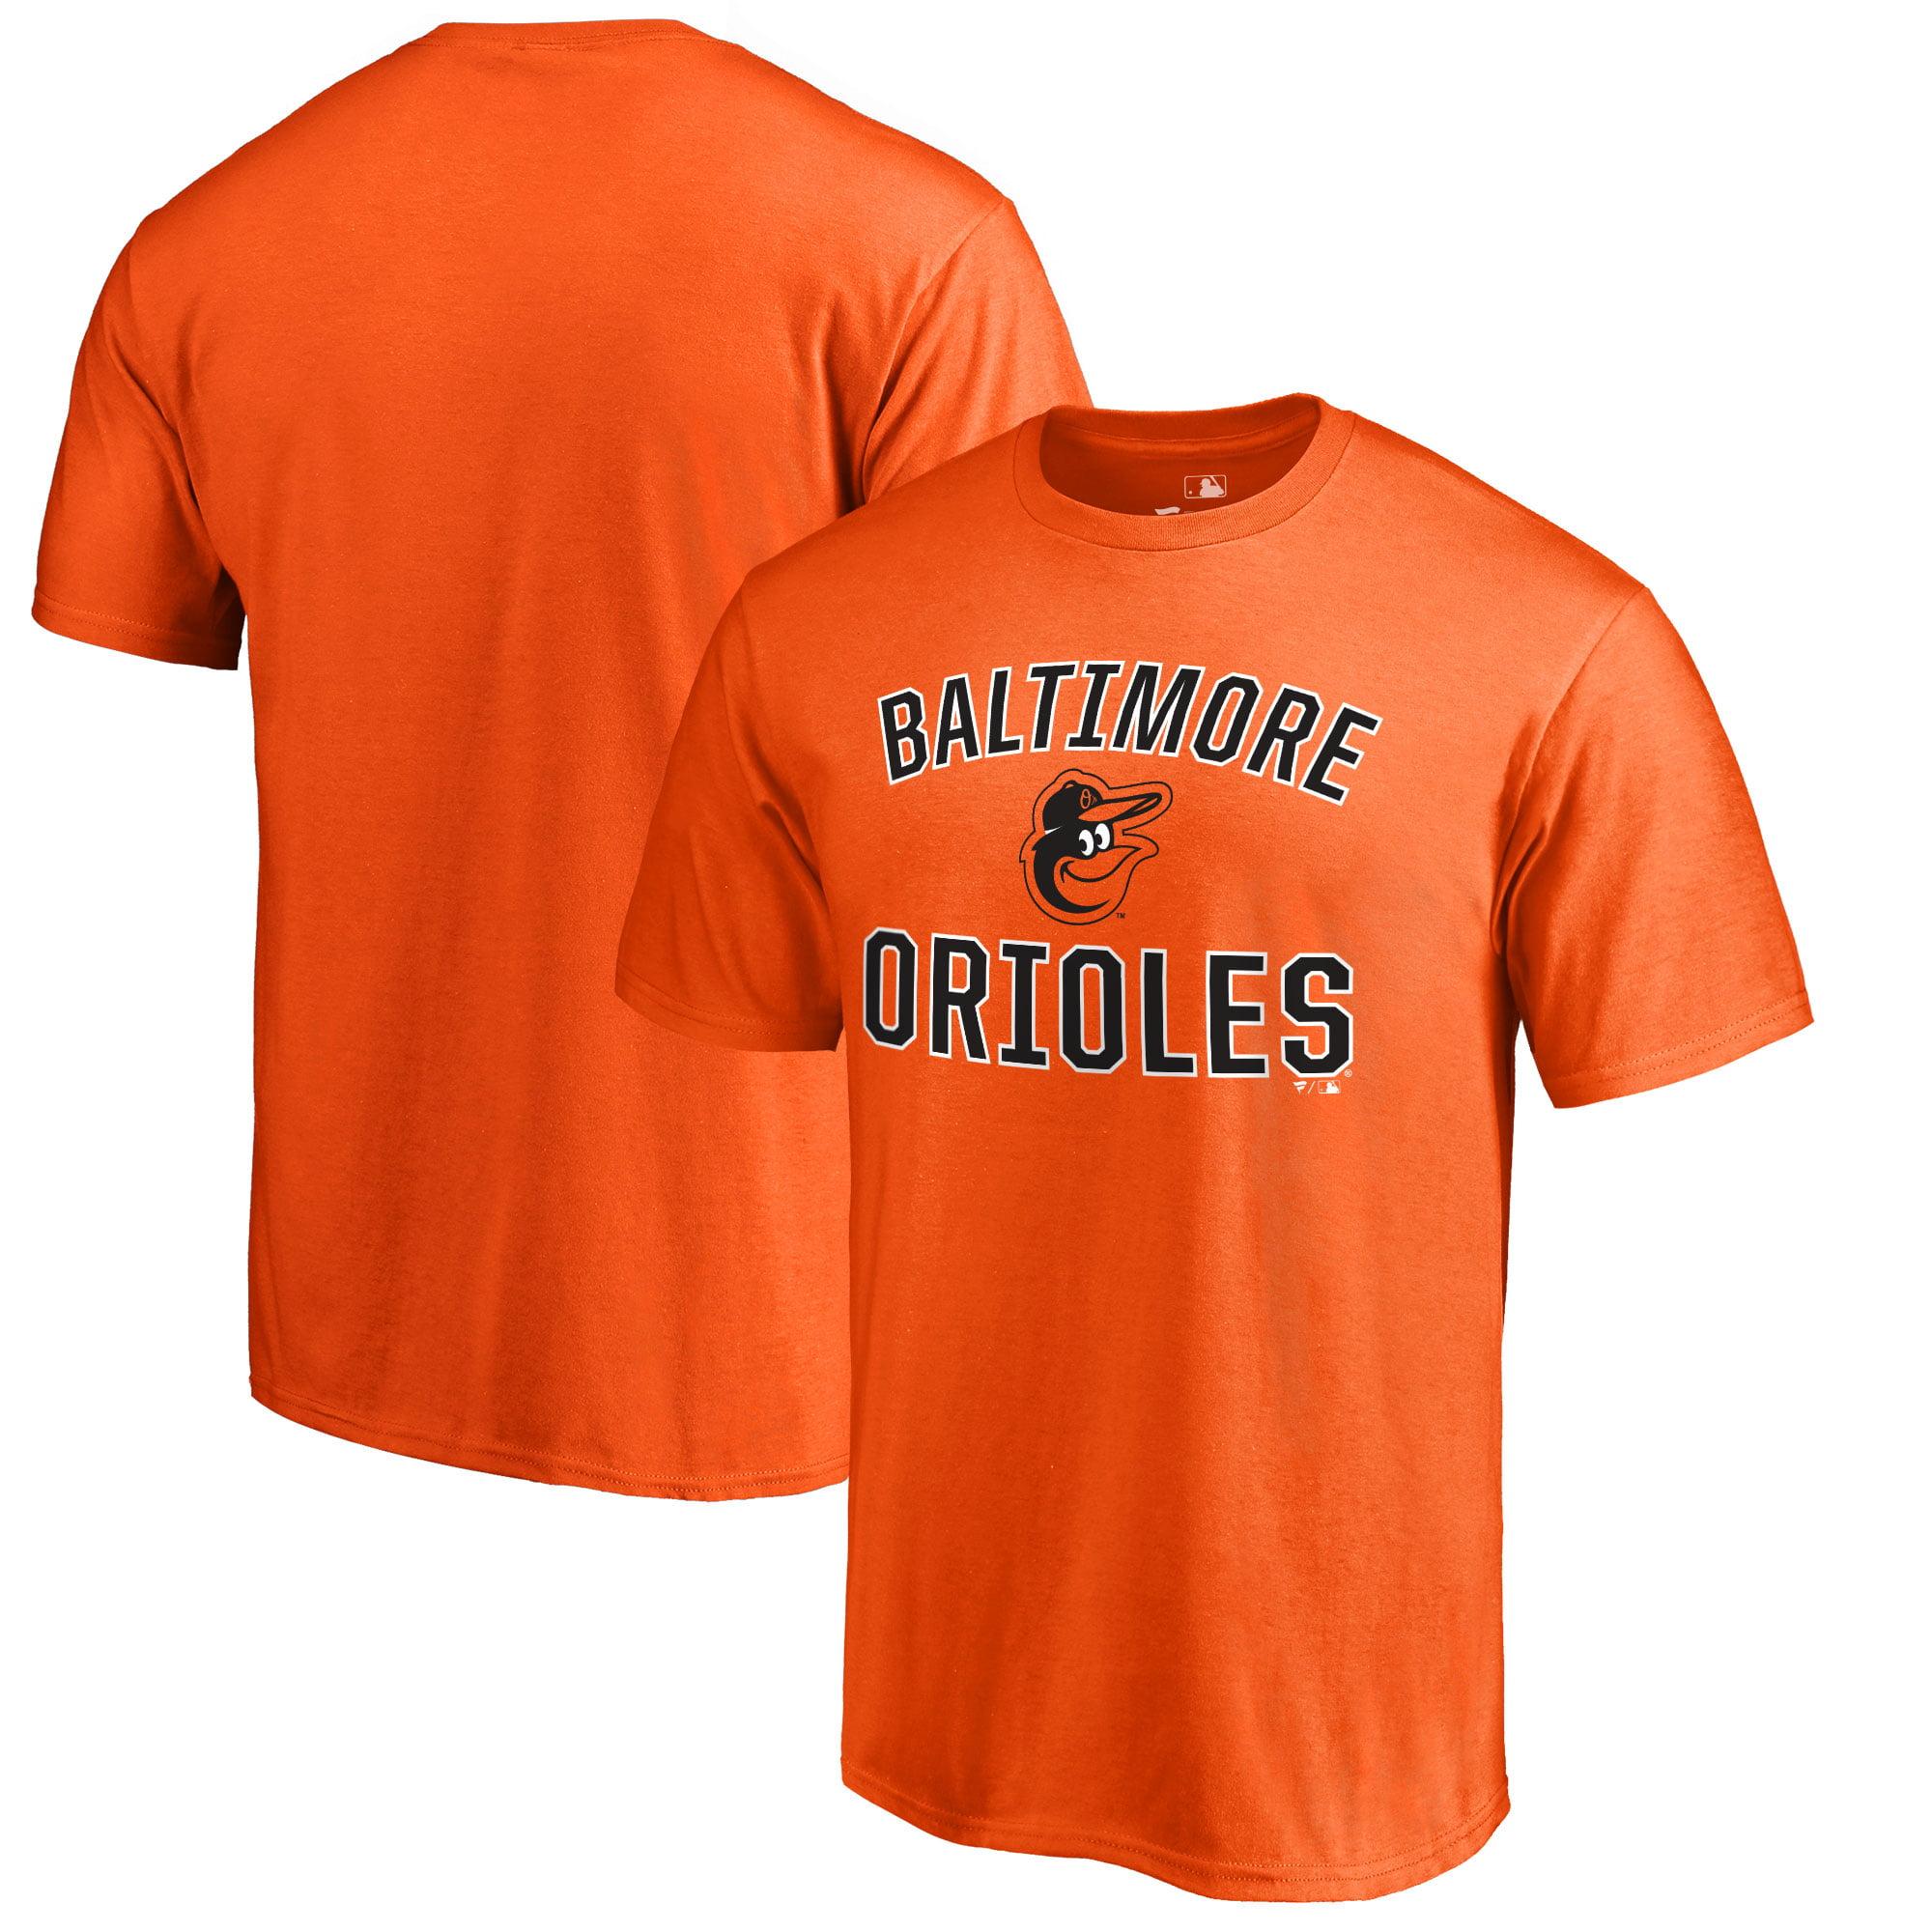 Baltimore Orioles Victory Arch T-Shirt - Orange